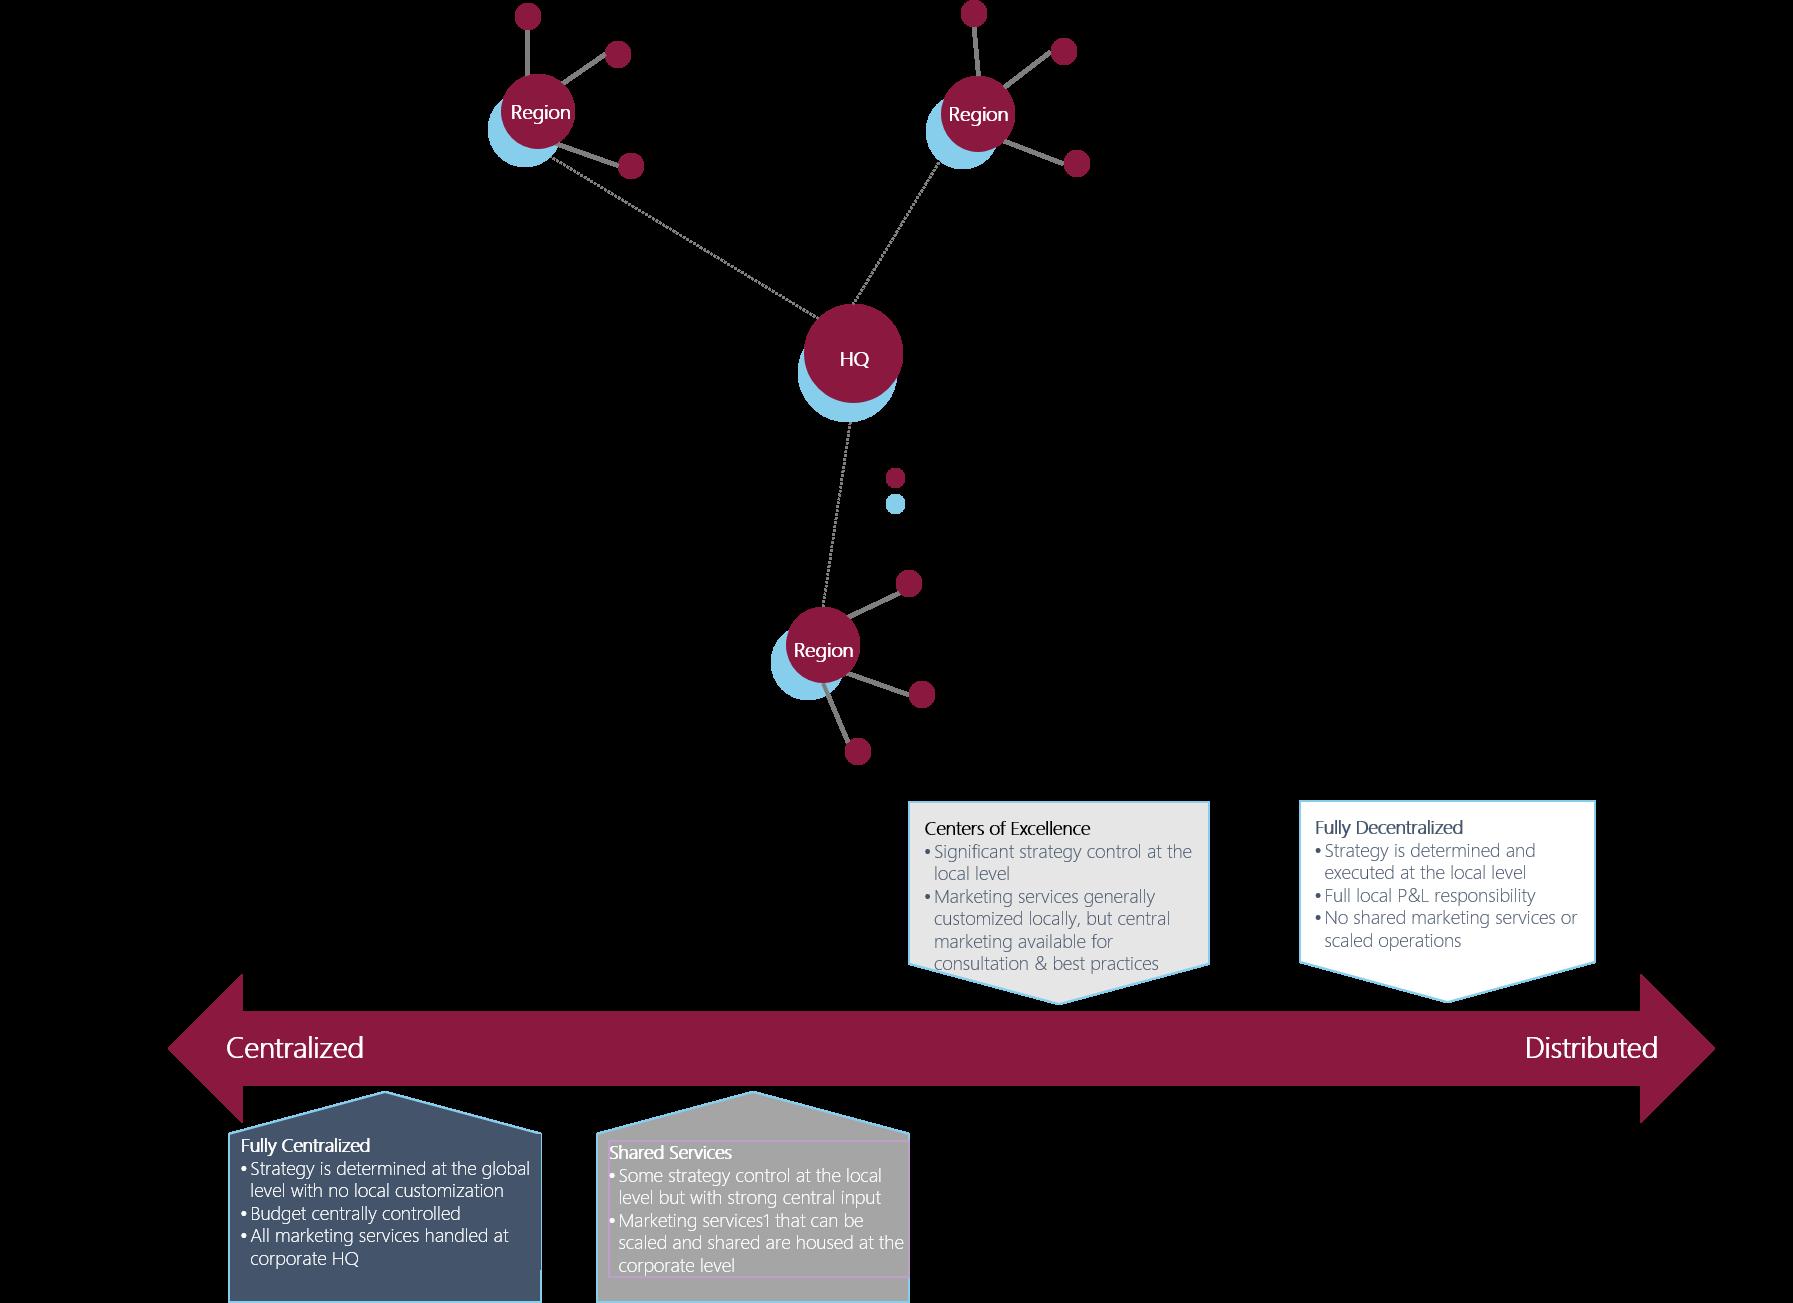 Example Global Marketing and Hub Footprint Responsibilities